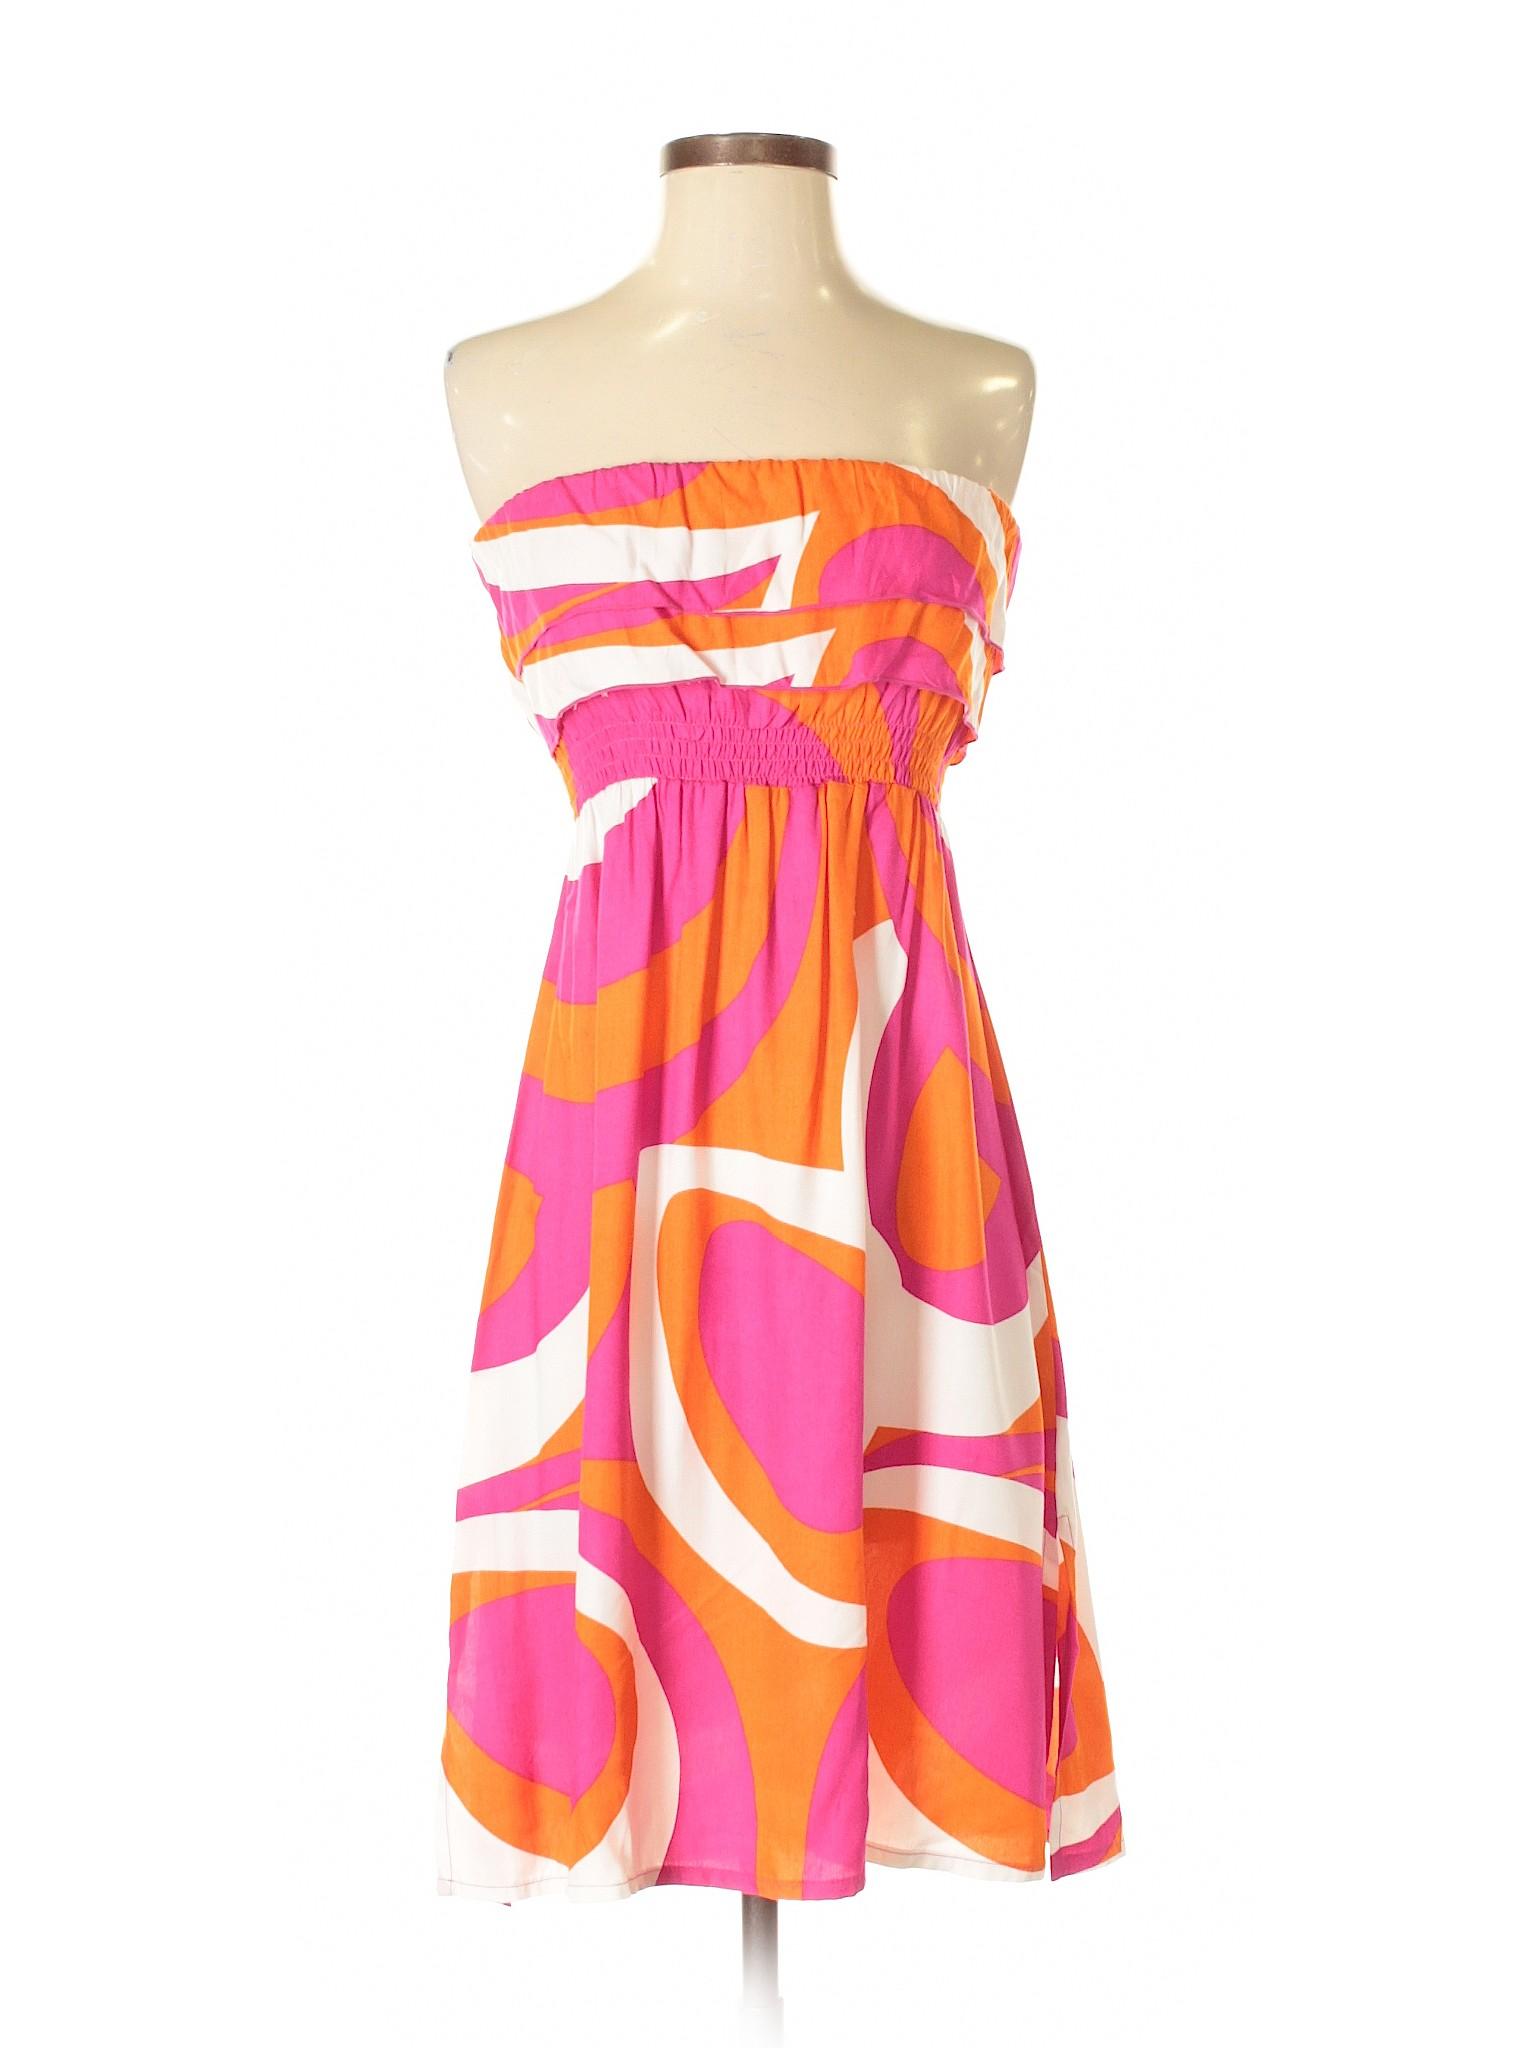 winter Boutique Casual Escapada Escapada Casual Dress winter Dress Boutique winter Escapada Boutique UqRx4pwH